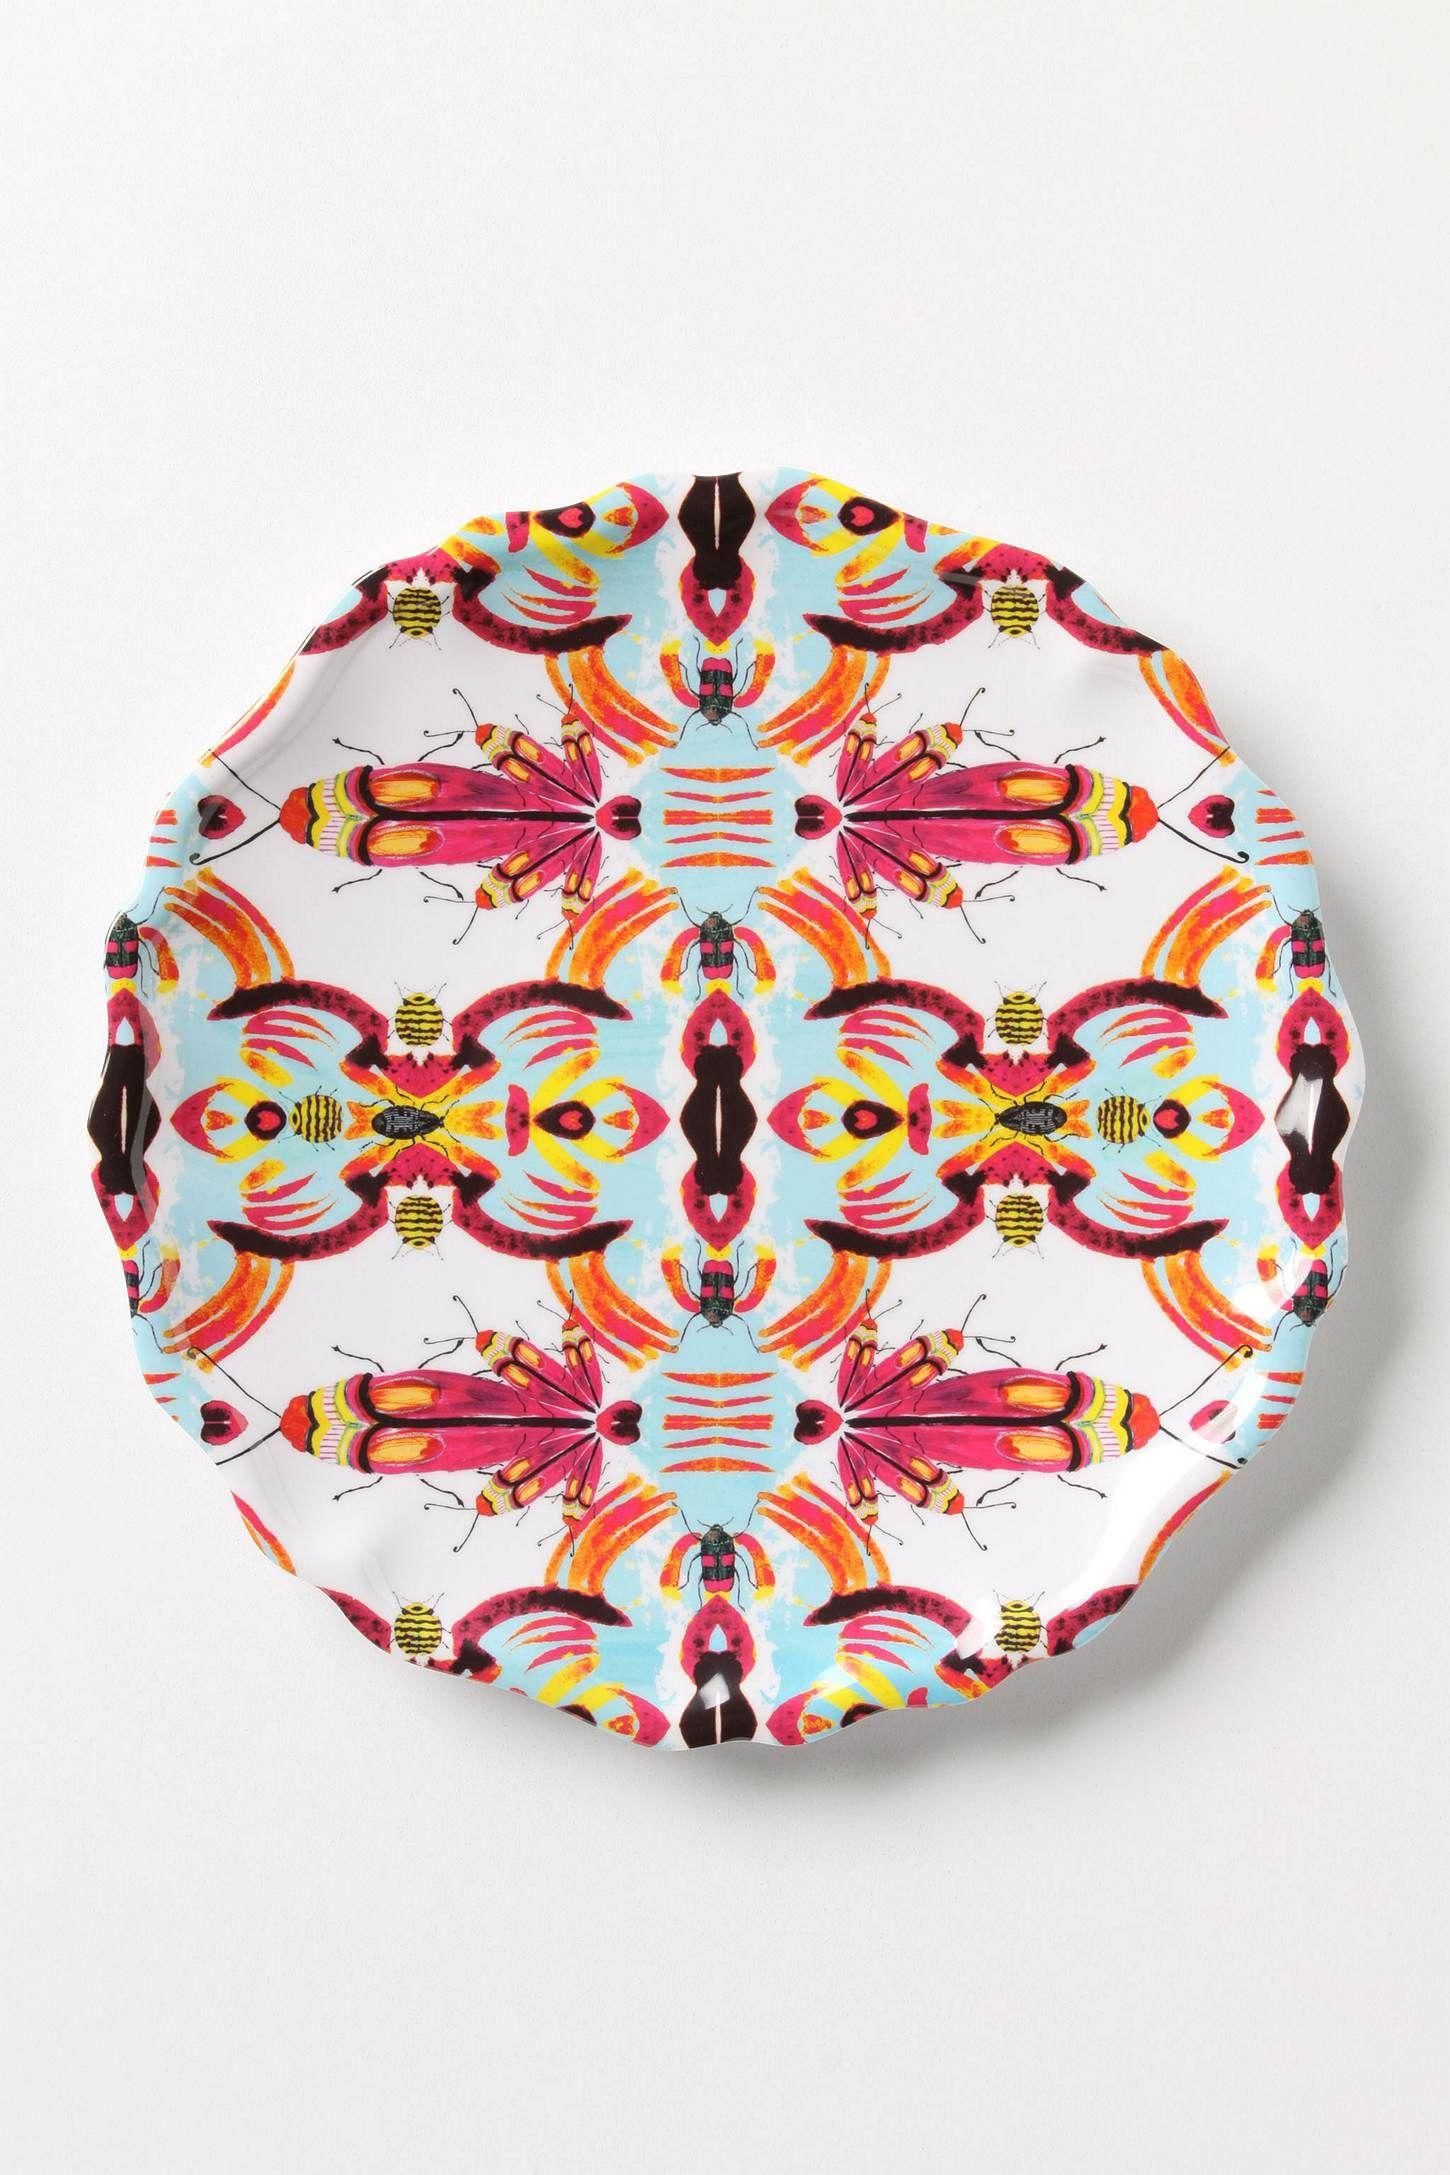 Kaleidobug Melamine Plate - Anthropologie.com  sc 1 st  Pinterest & Kaleidobug Melamine Plate - Anthropologie.com | Insect Obsession ...